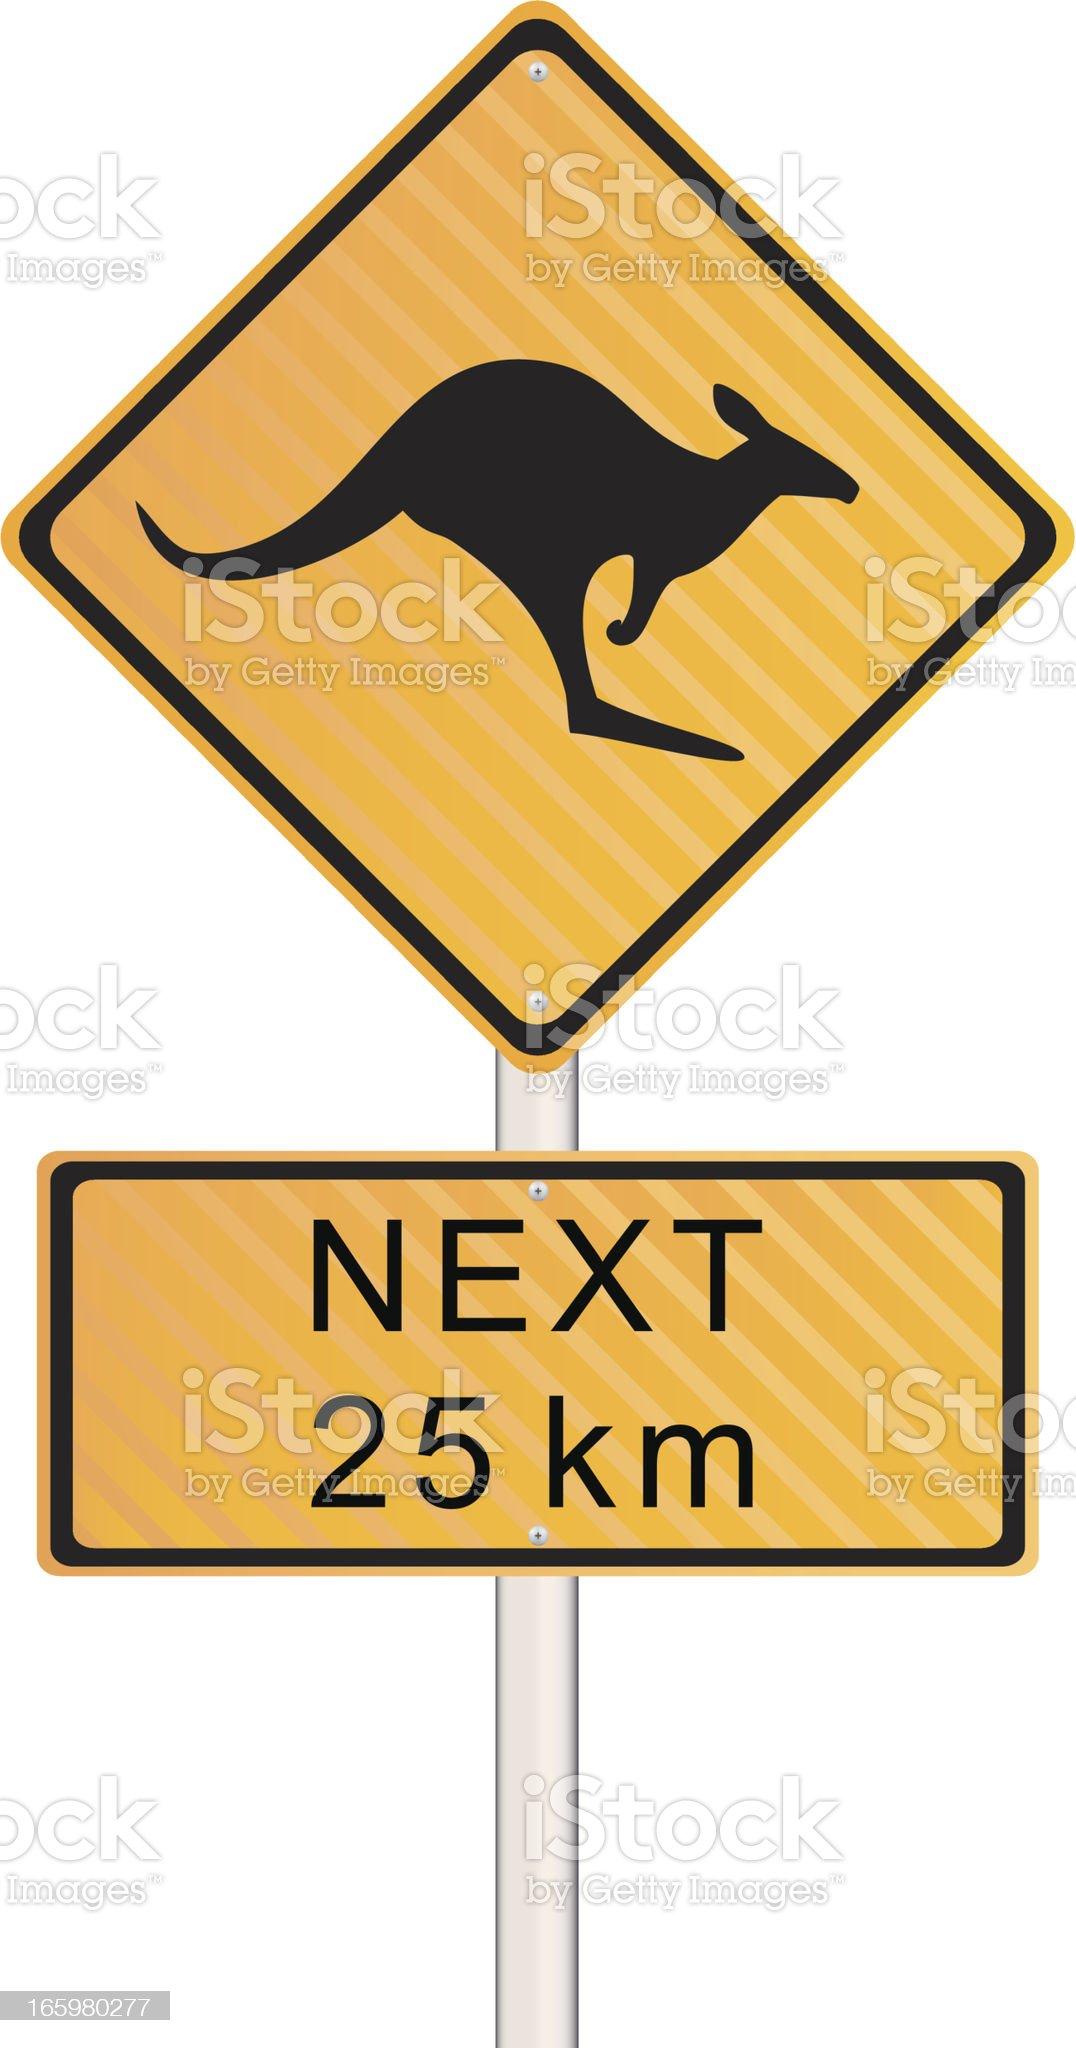 Kangaroo Crossing Sign royalty-free stock vector art